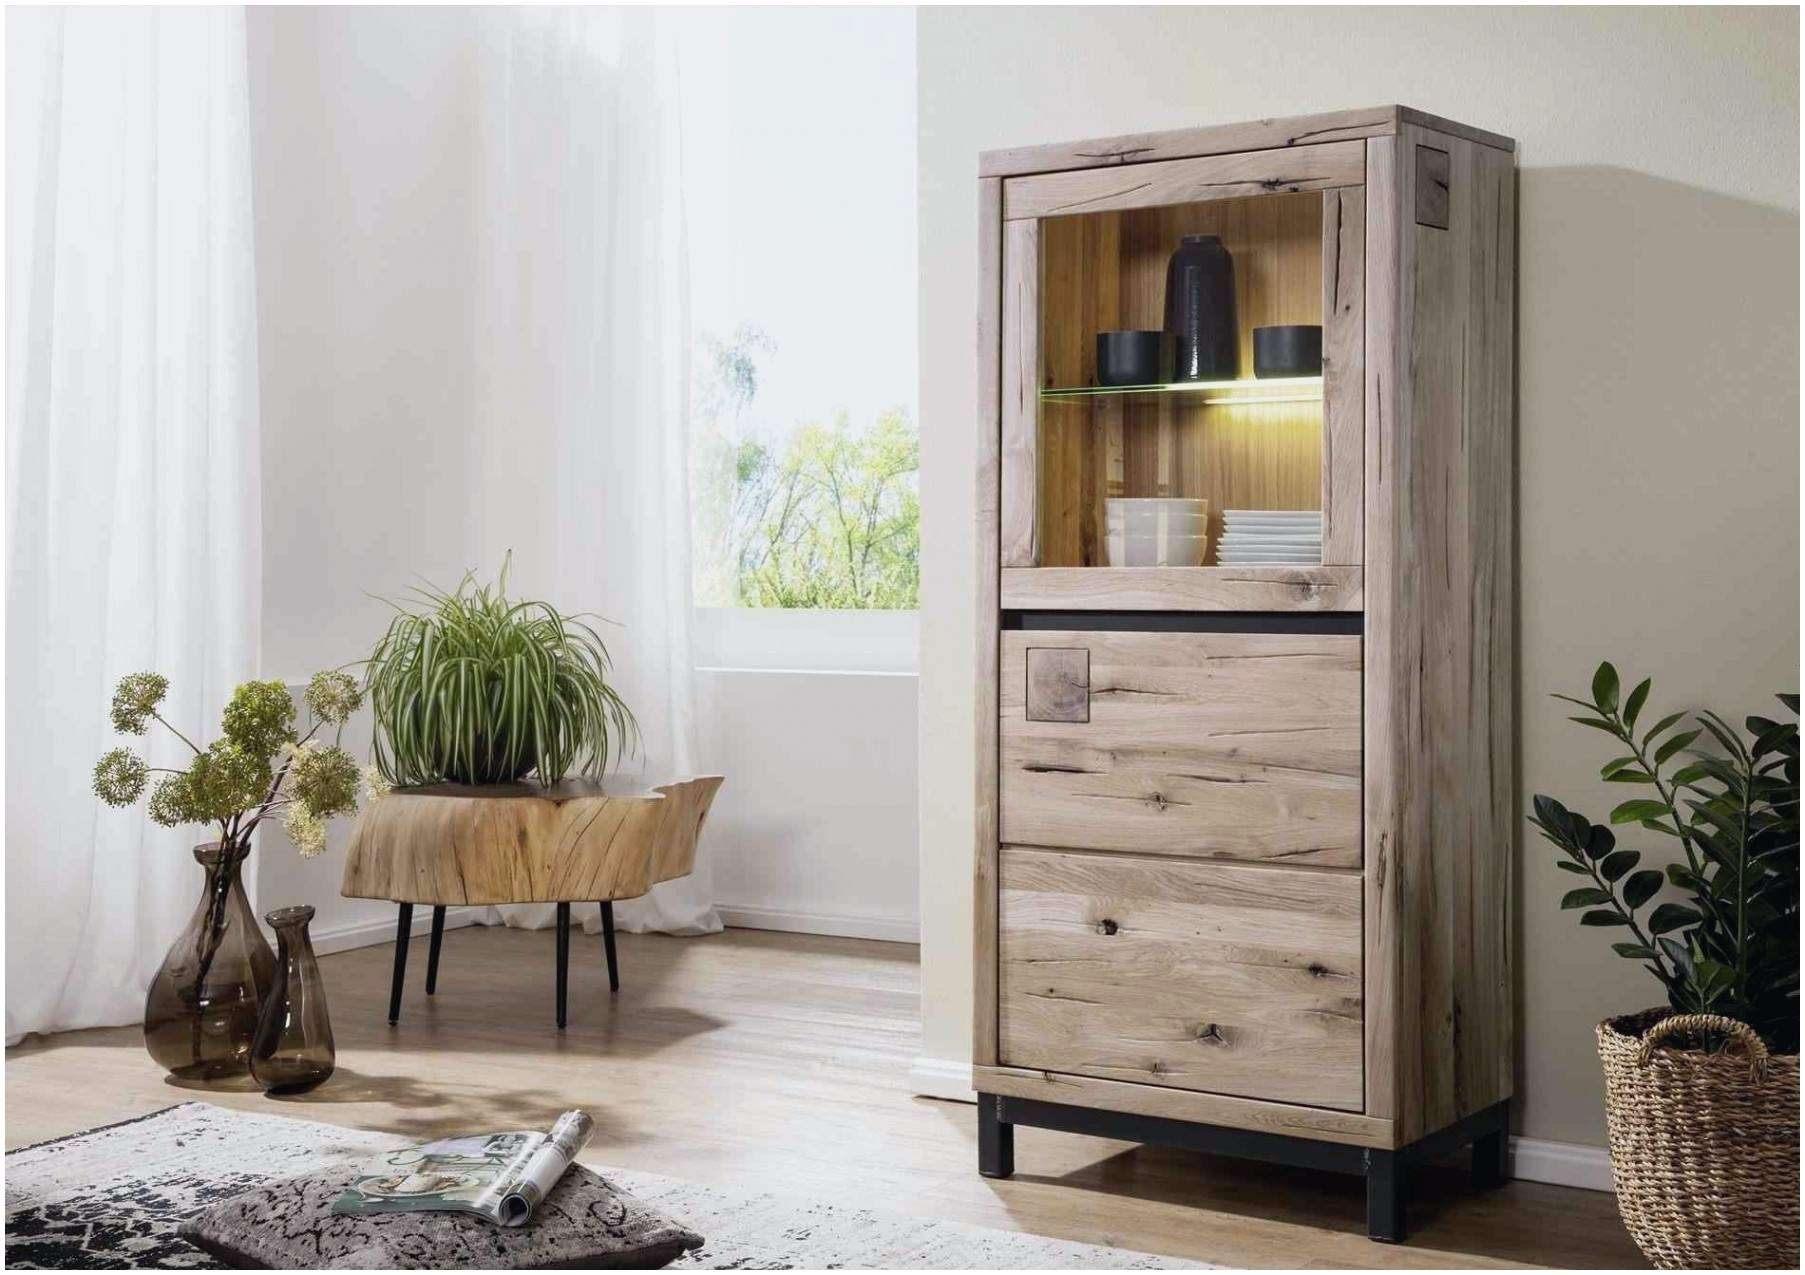 Lit Bureau Ikea Beau Luxe Extraordinaire Bureau Angle Ikea but Trendy New Study Reveals